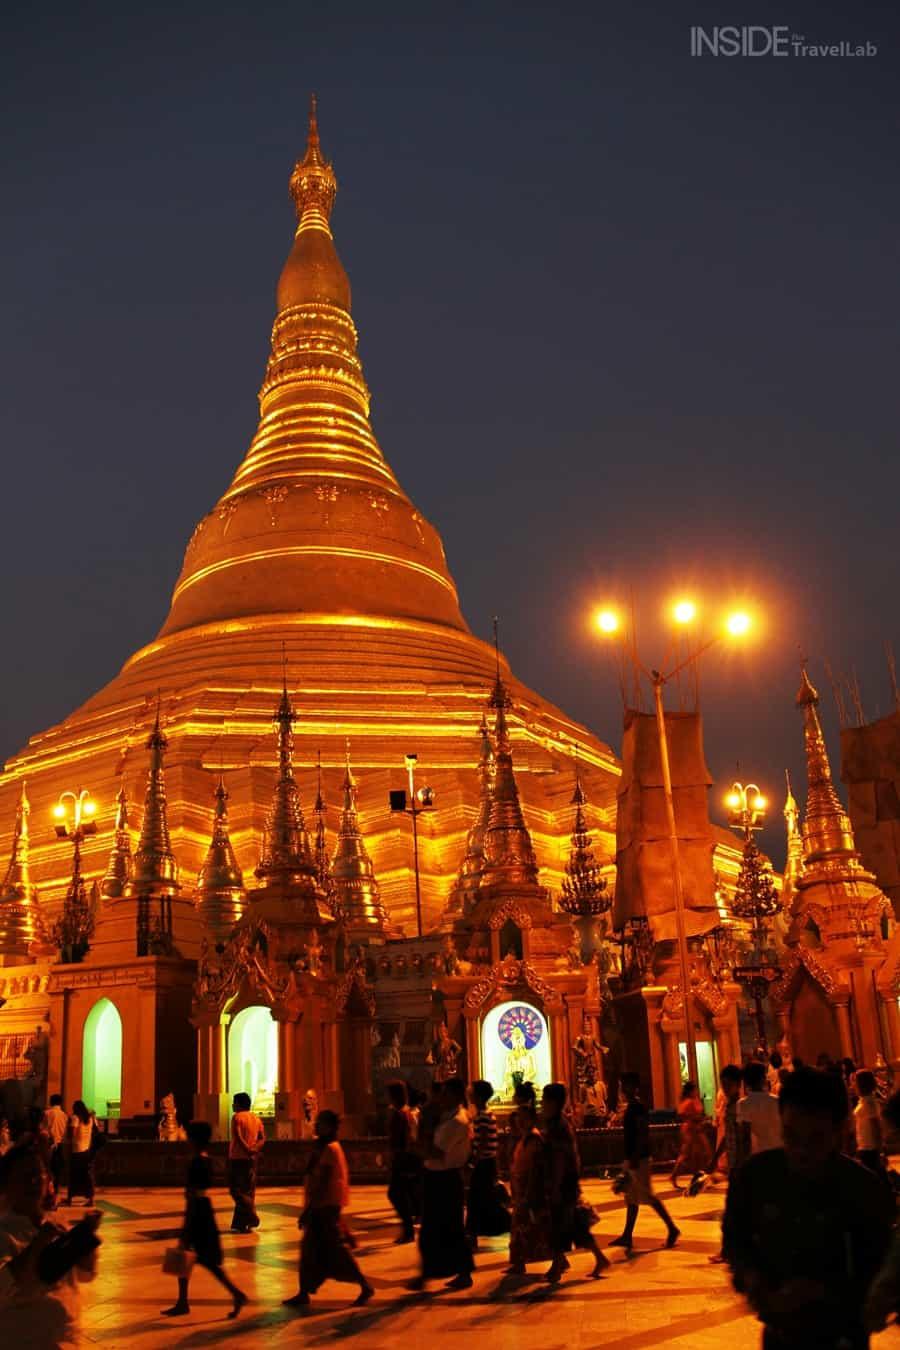 Shwedagon Pagoda with people at night